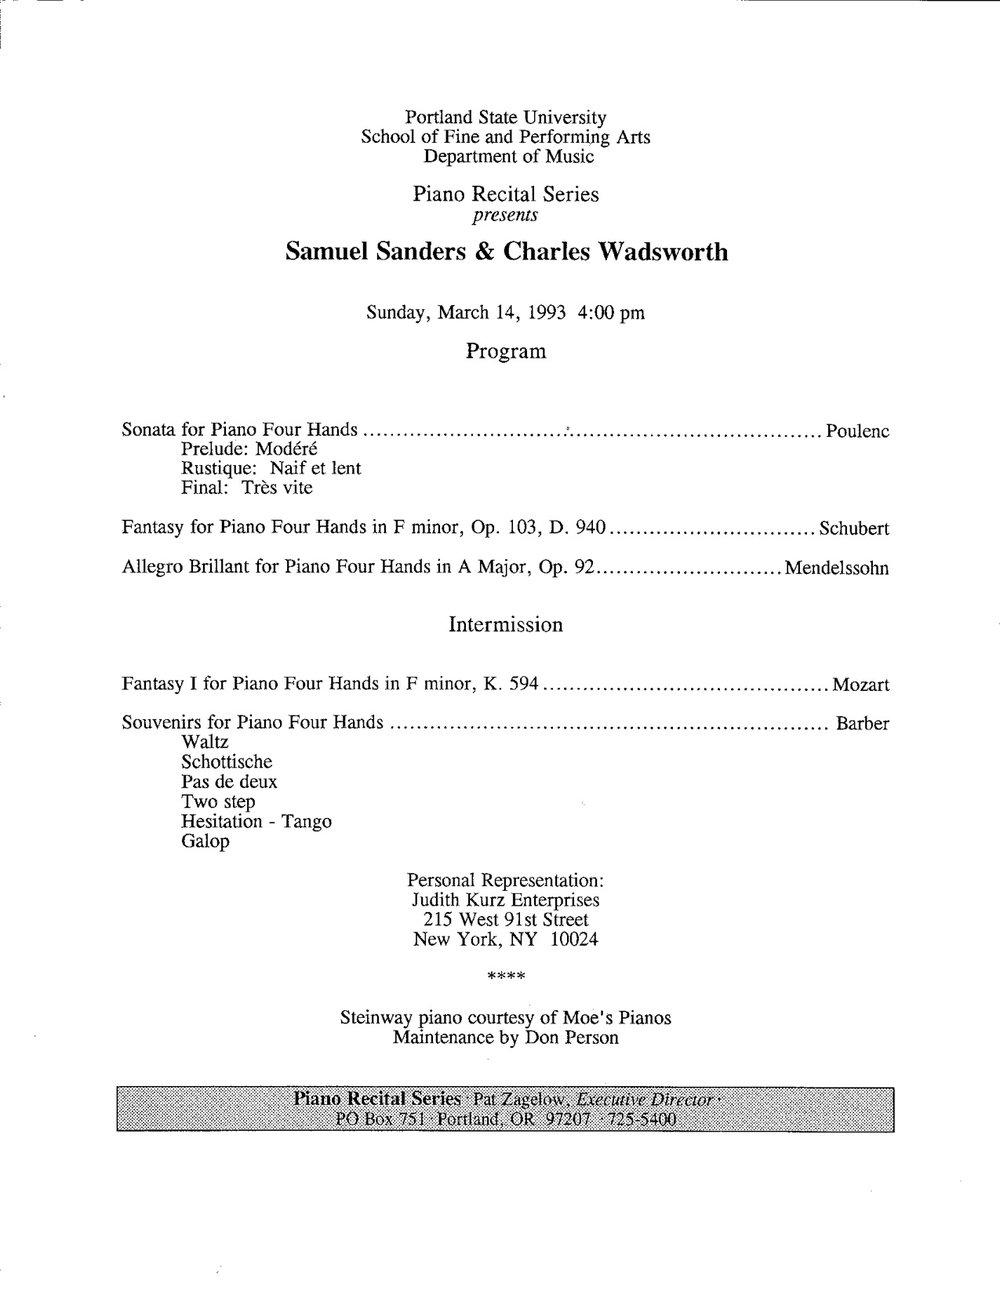 SsandersWadsworth92-93_Program2.jpg